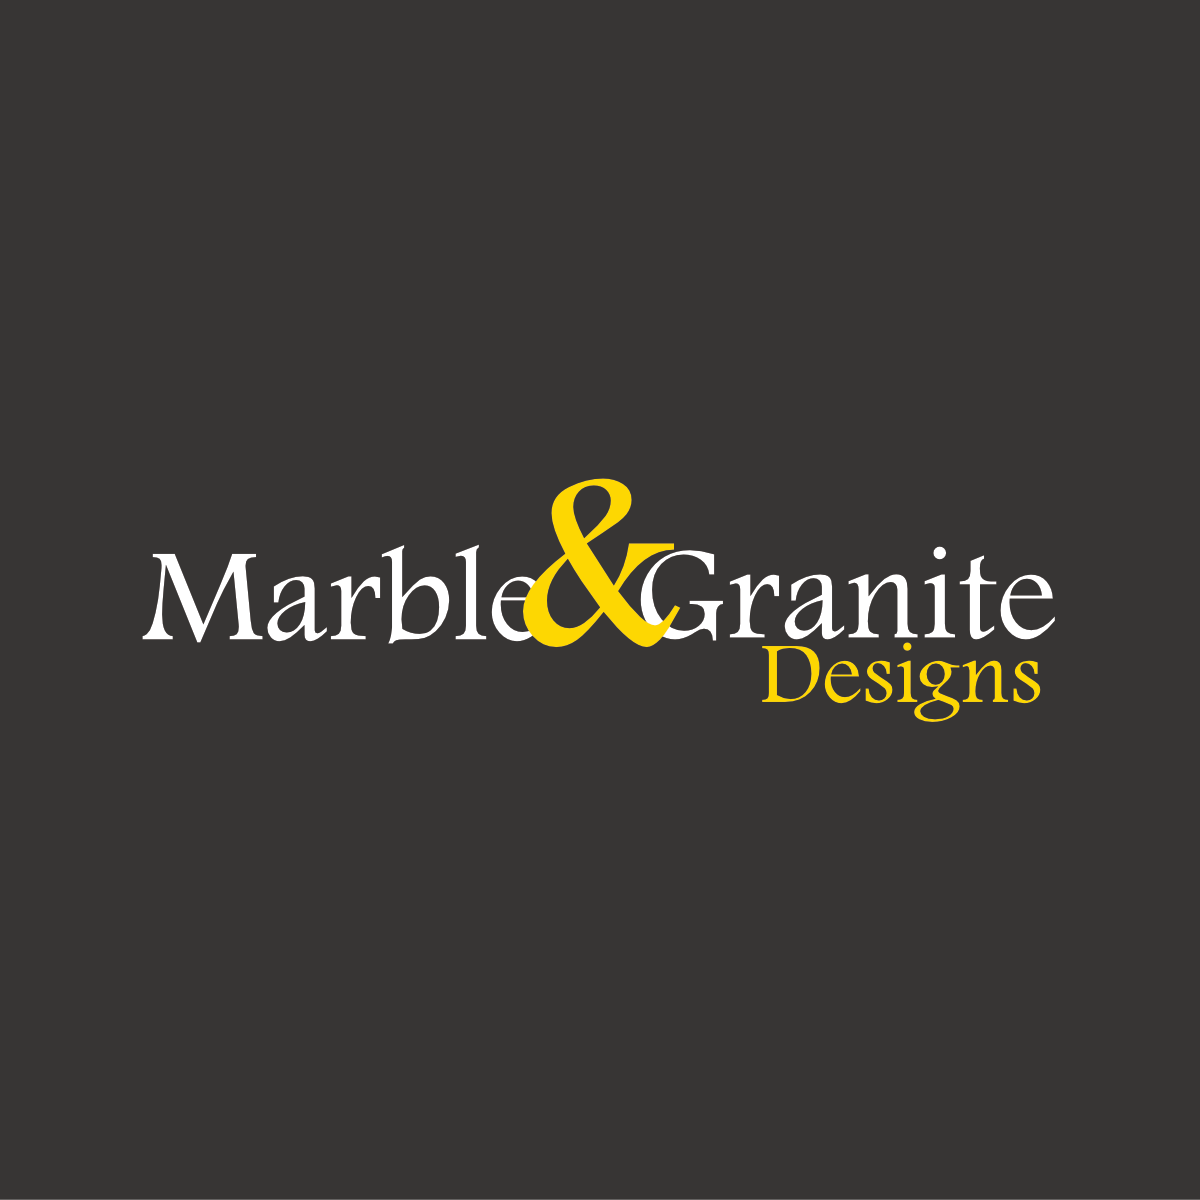 Marble & granite designs ltd.